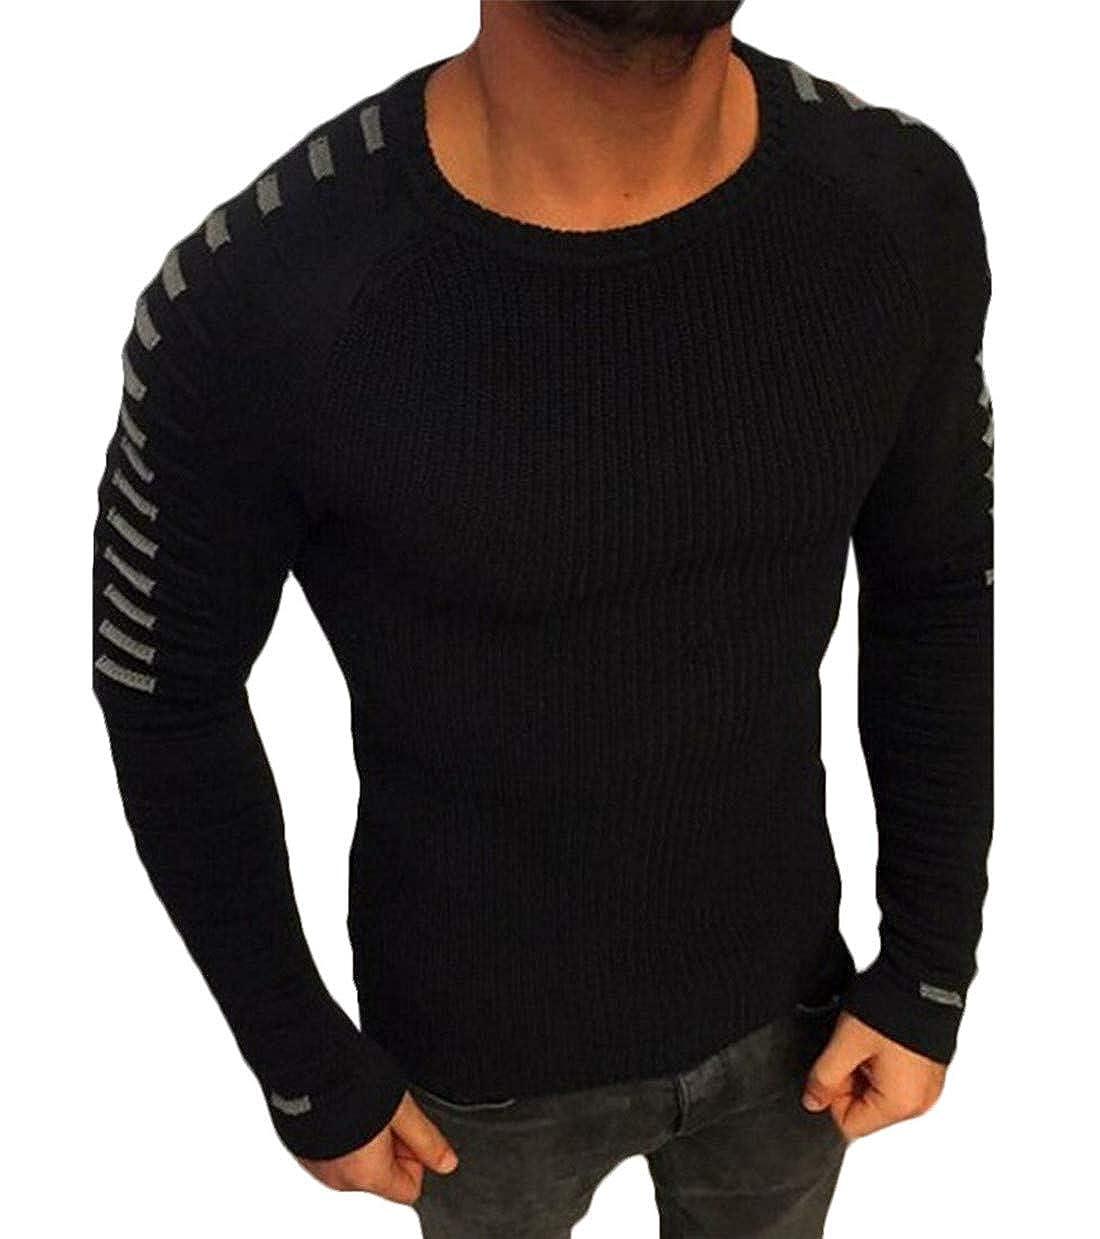 Nanquan Men Hipster Hip Hop Crewneck Pullover Knitted Sweater Jumper Tops